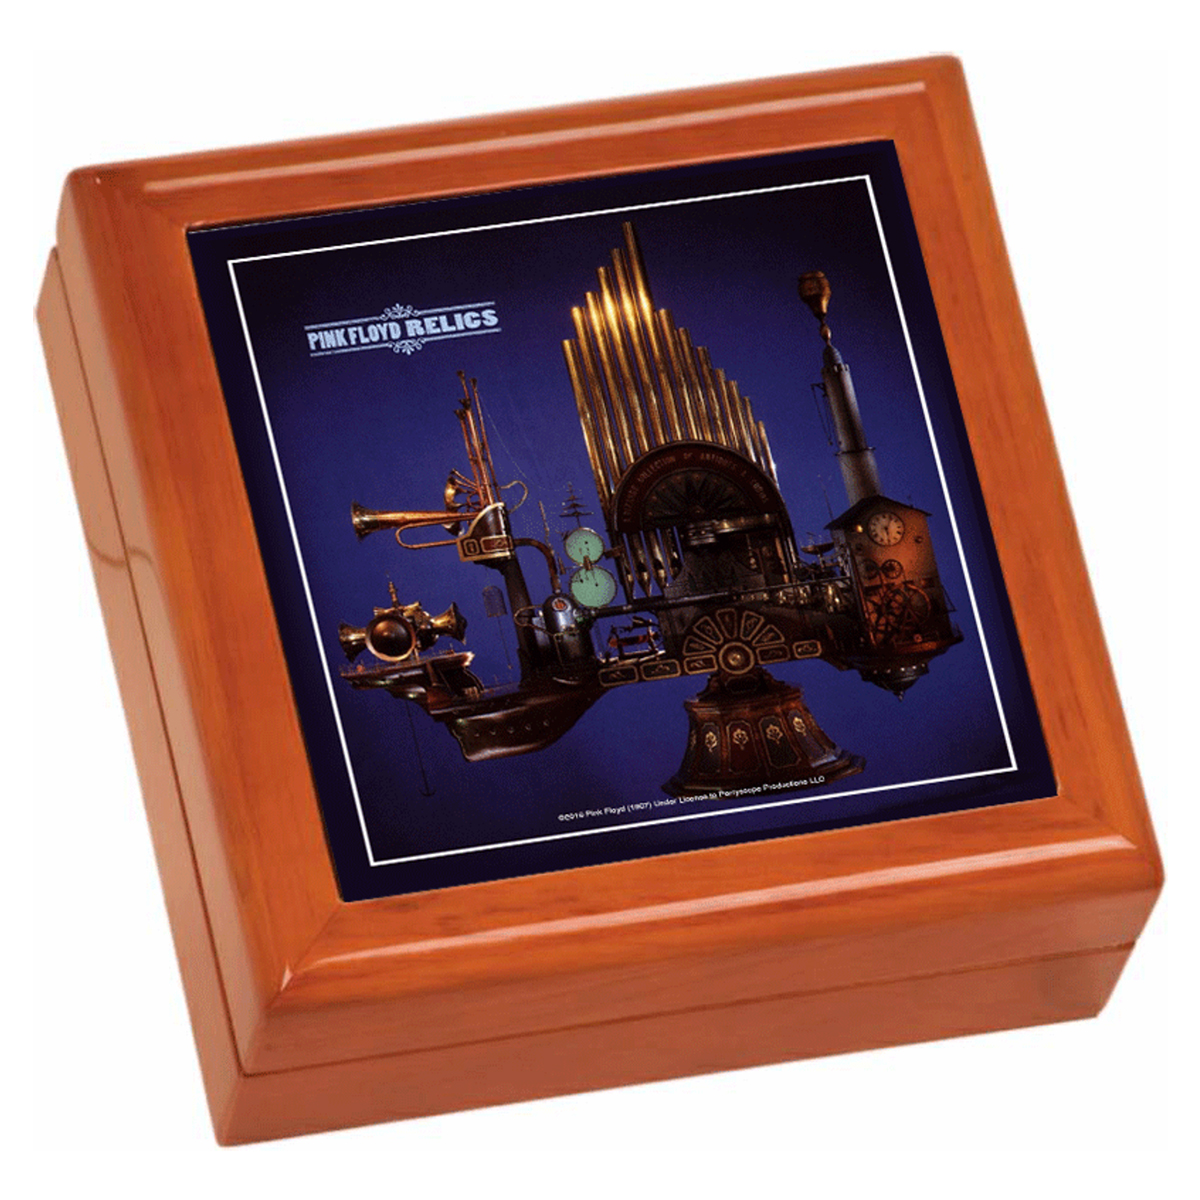 Relics Wooden Keepsake Box